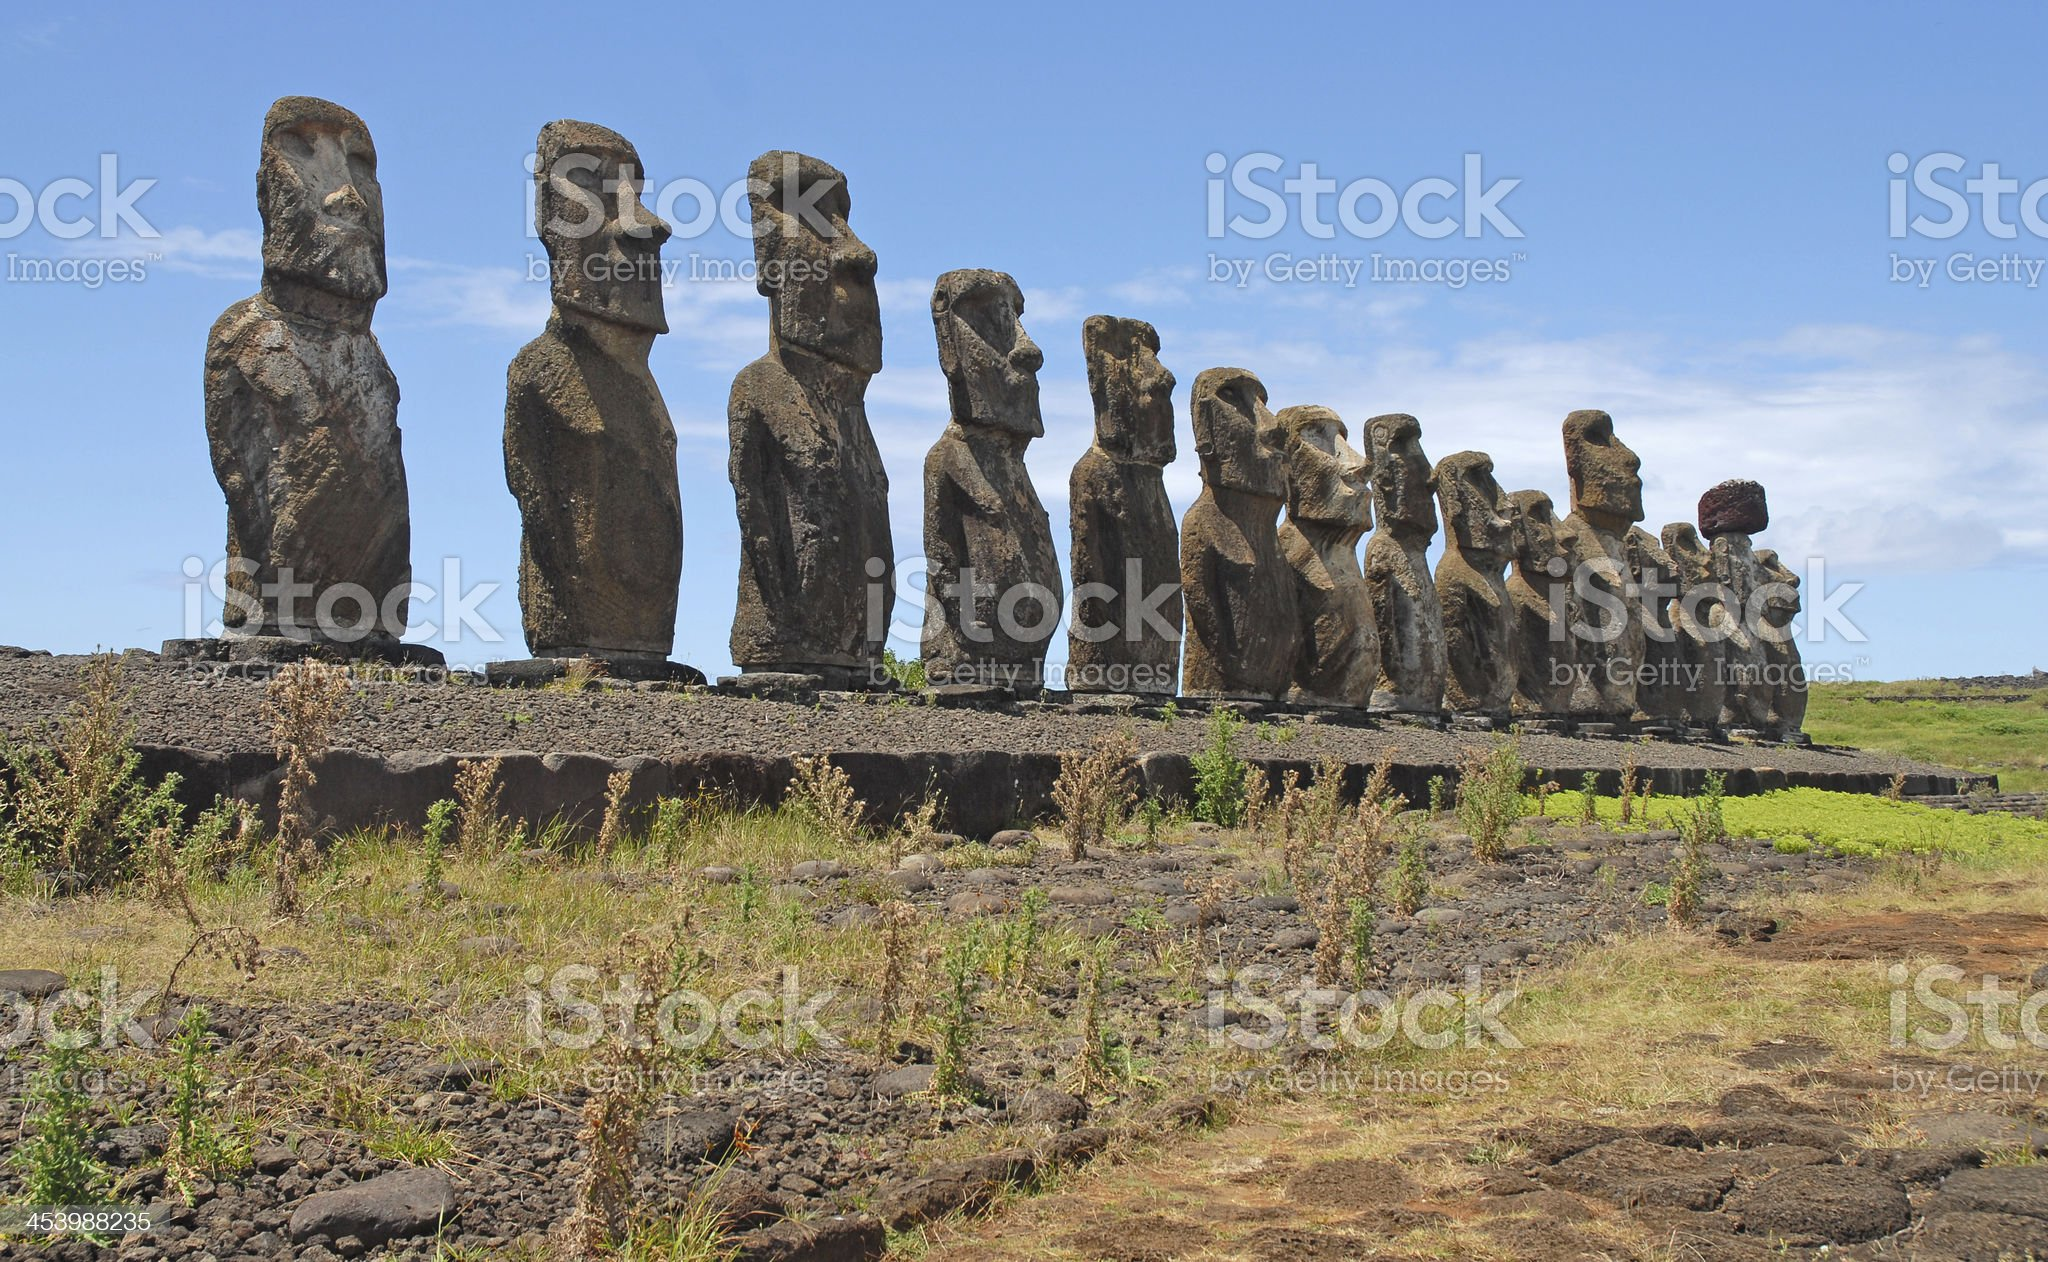 Moai Stone Statue at Rapa Nui - Easter Island, Chile royalty-free stock photo